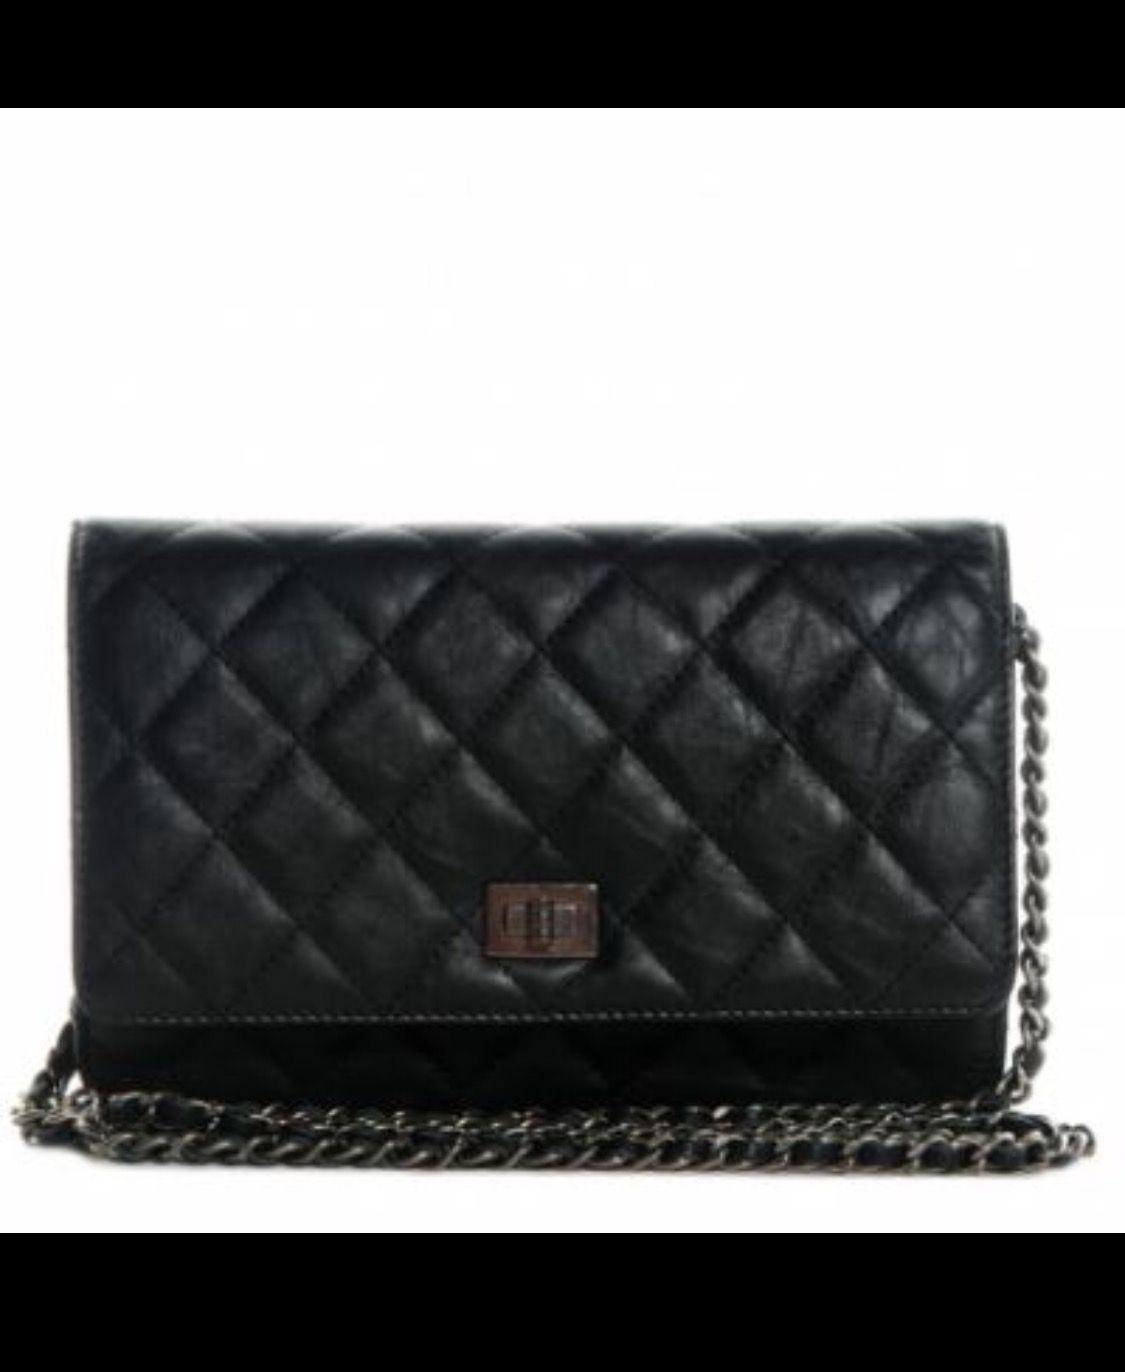 b27e835548f49d Chanel Reissue WOC (Wallet On Chain)   Stuff I Love   Chanel, Bags ...